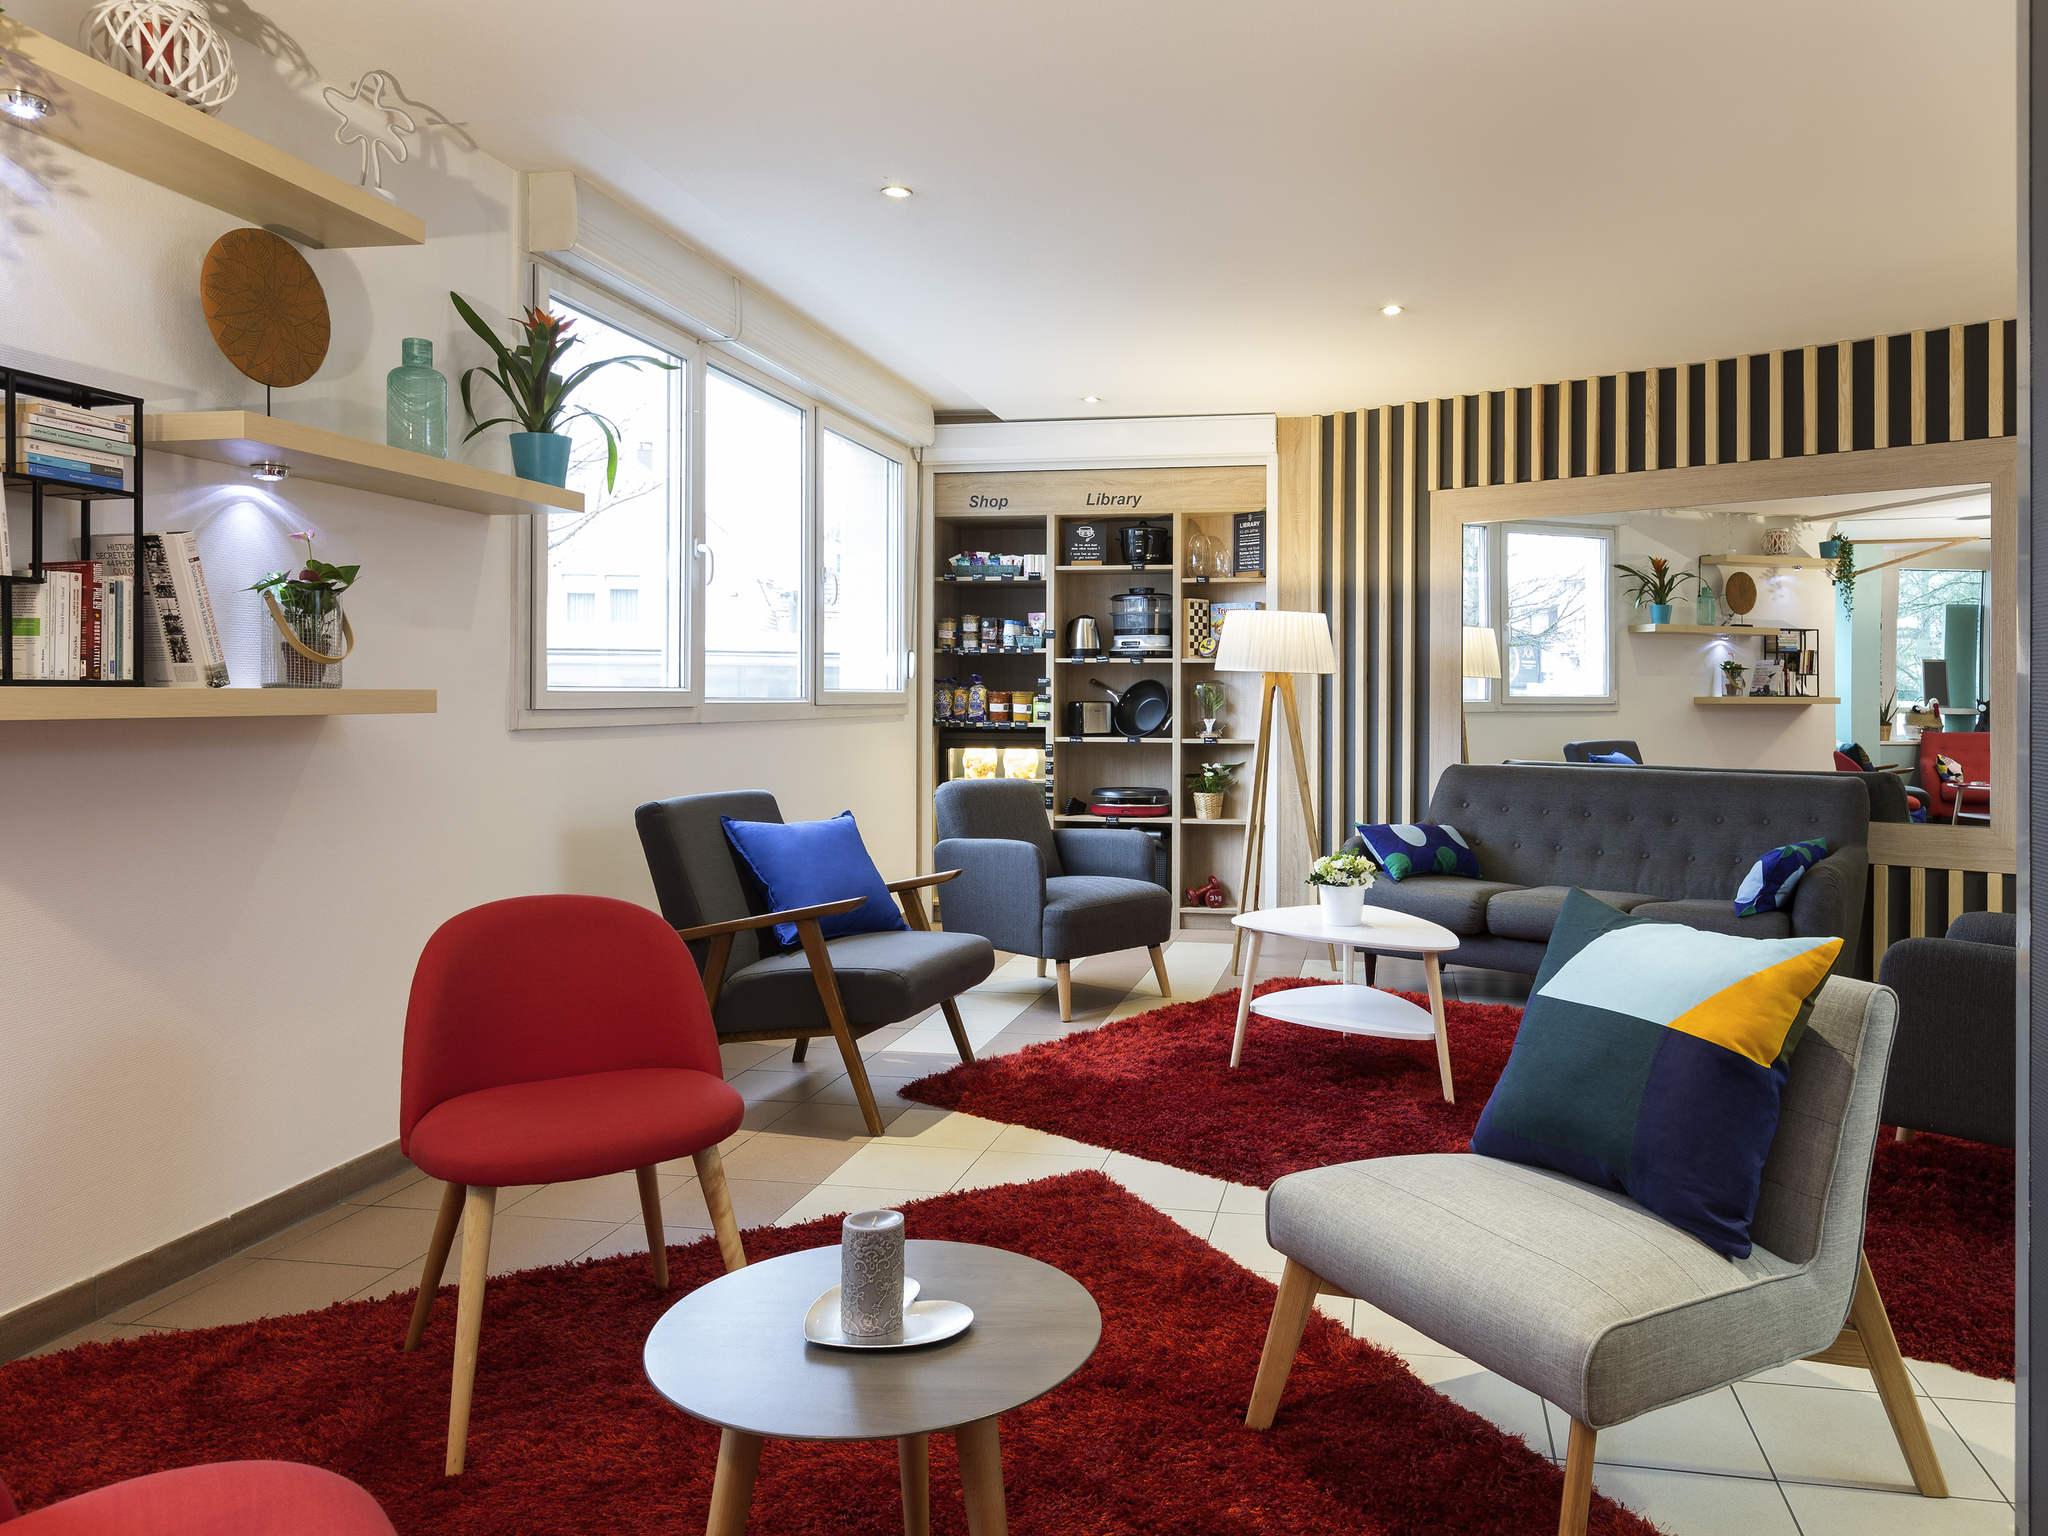 Отель — Aparthotel Adagio access Strasbourg Illkirch